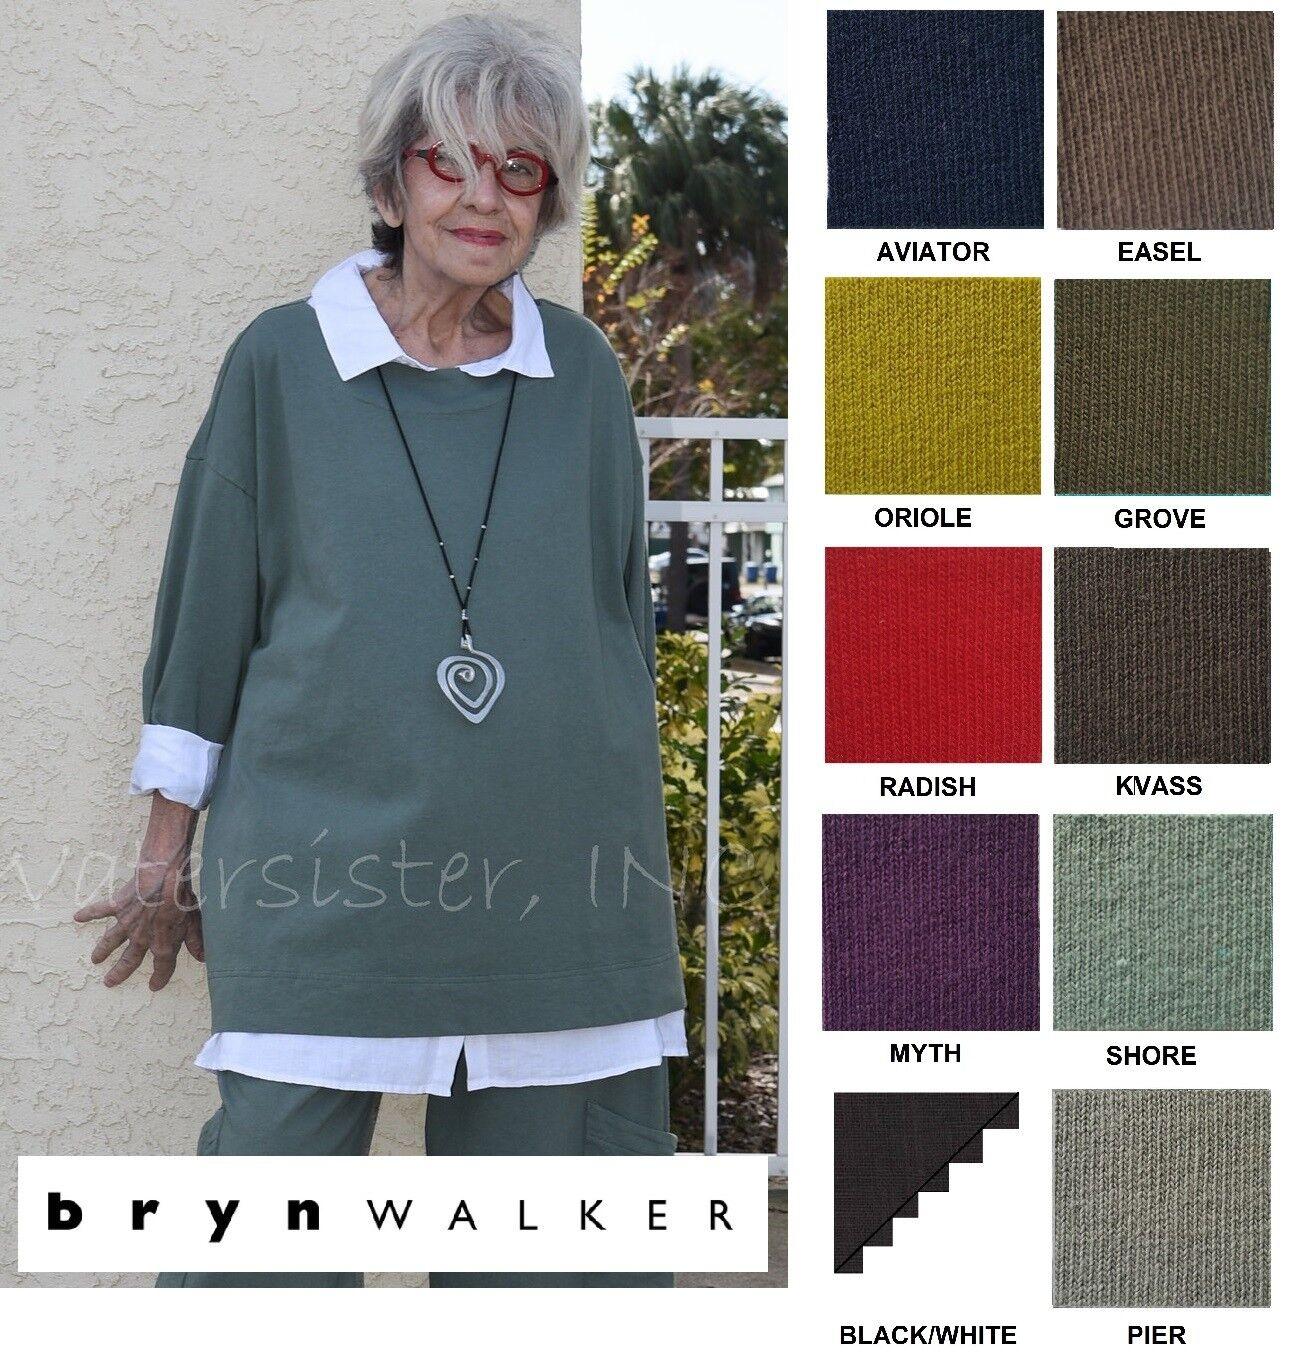 PACIFICOTTON Bryn Walker Pacific Cotton RESORT SHIRT Boxy Top  1X 2X 3X SPR 2018